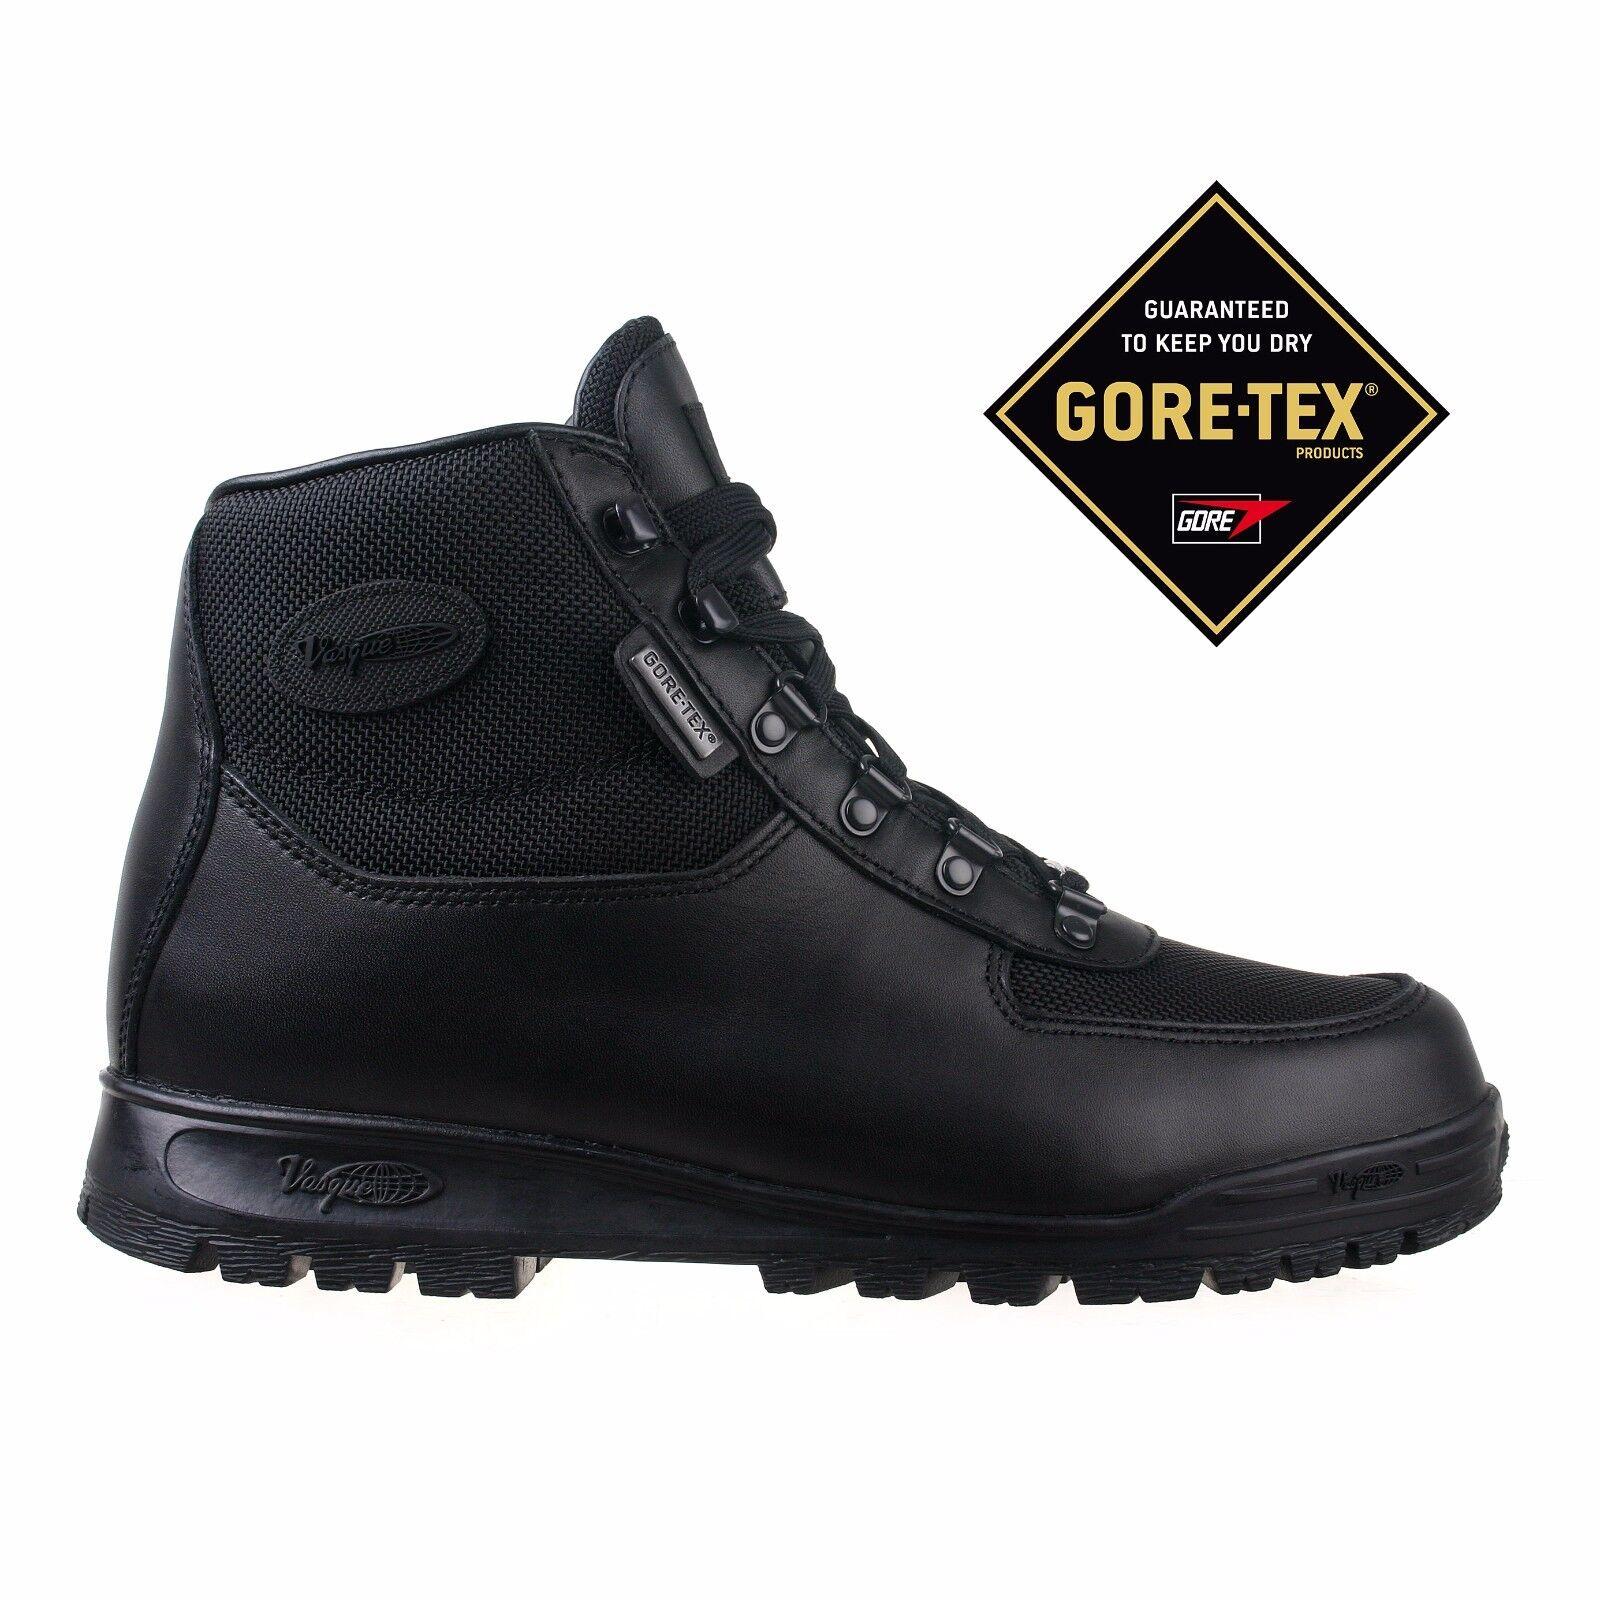 Vasque Mens stivali Gore-tex nero Skywalk Leather 7052